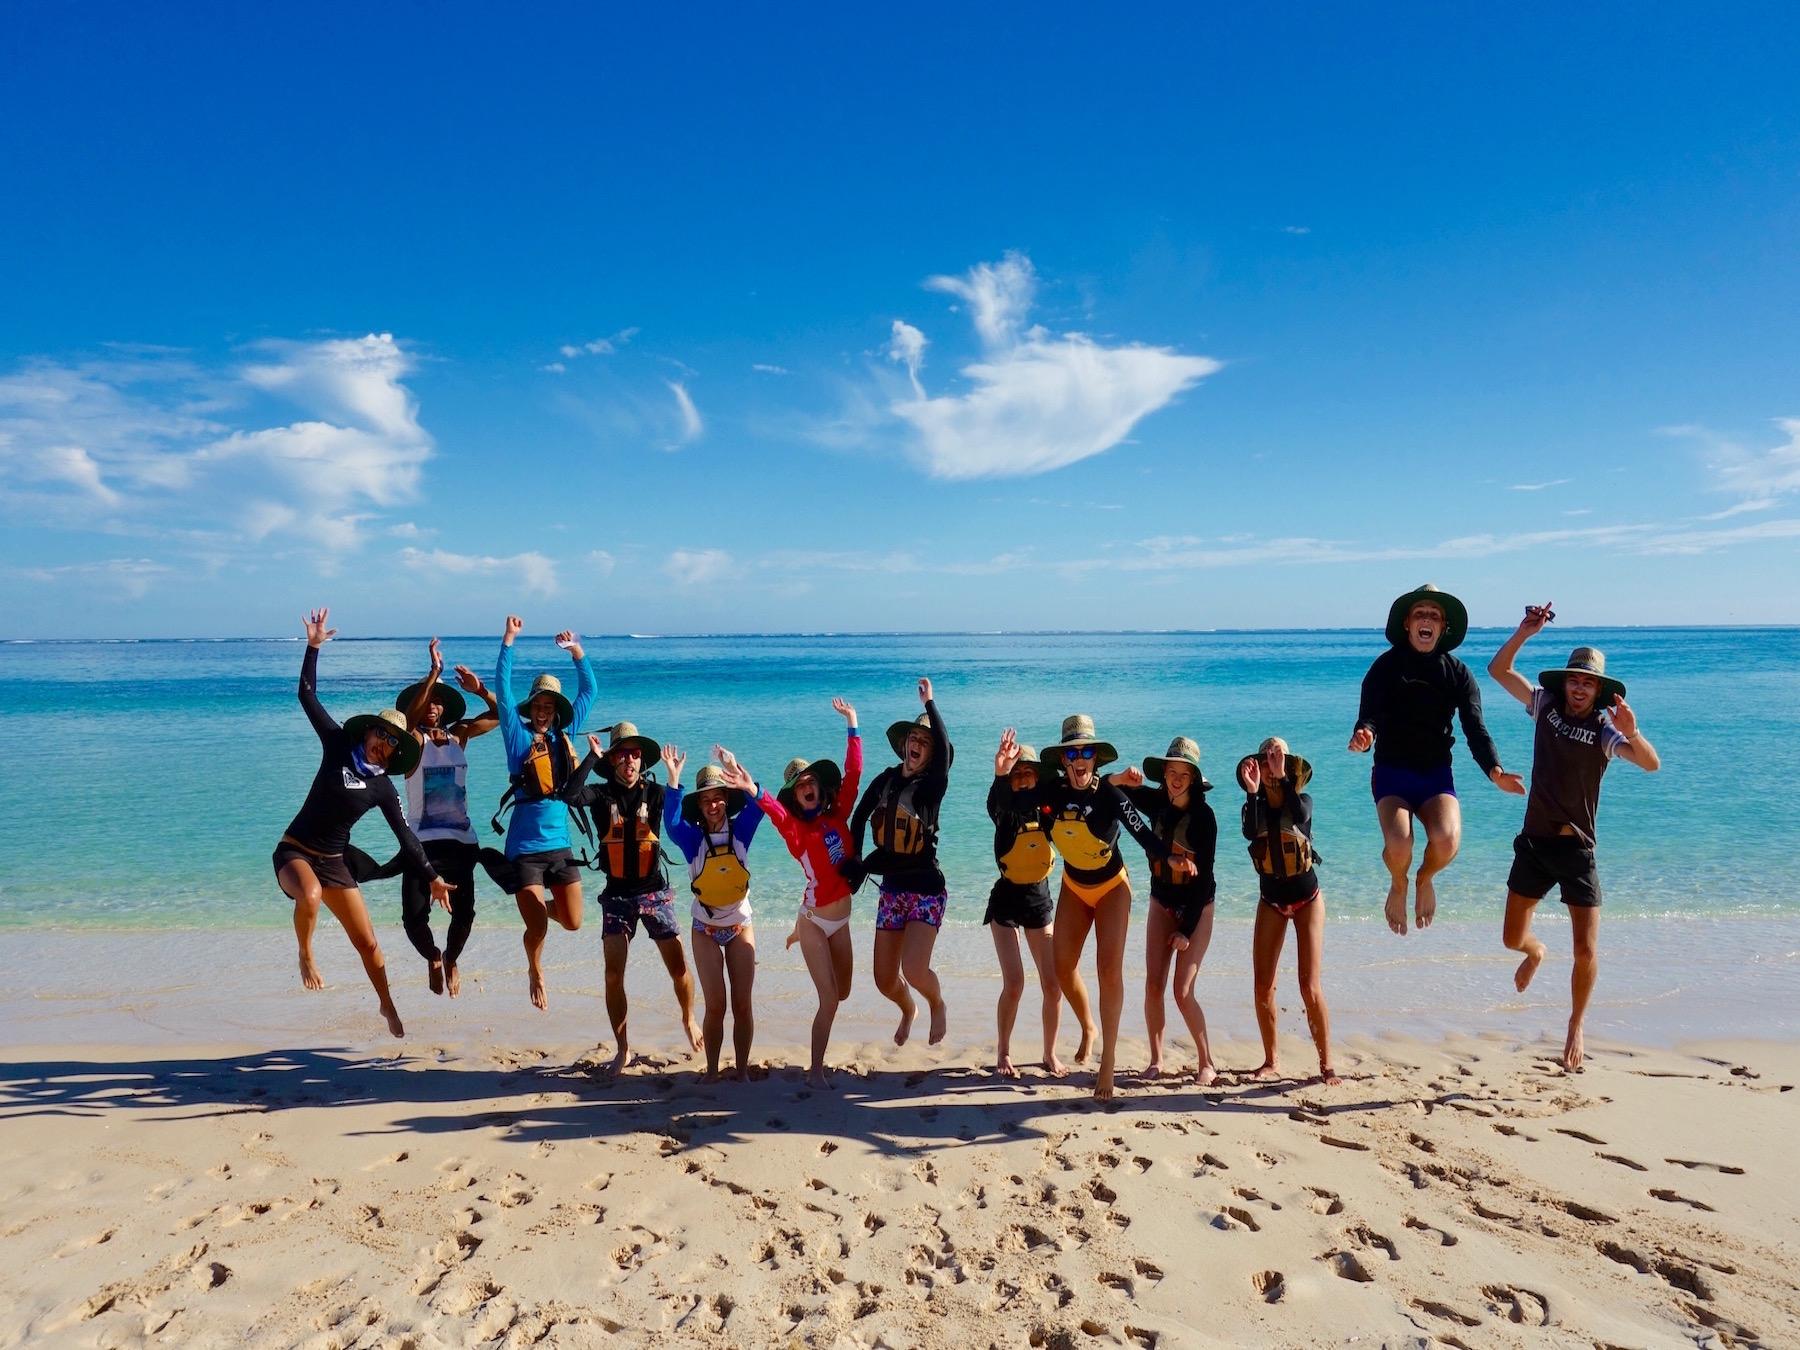 Sea Kayak, Snorkel, Eco Tour, Adventure, Learn to Surf, Stand Up Paddleboard, SUP, Exmouth, Ningaloo Reef, Cape Range National Park, Western Australia, School Programs, Youth, Corporate, Duke of Edinburgh